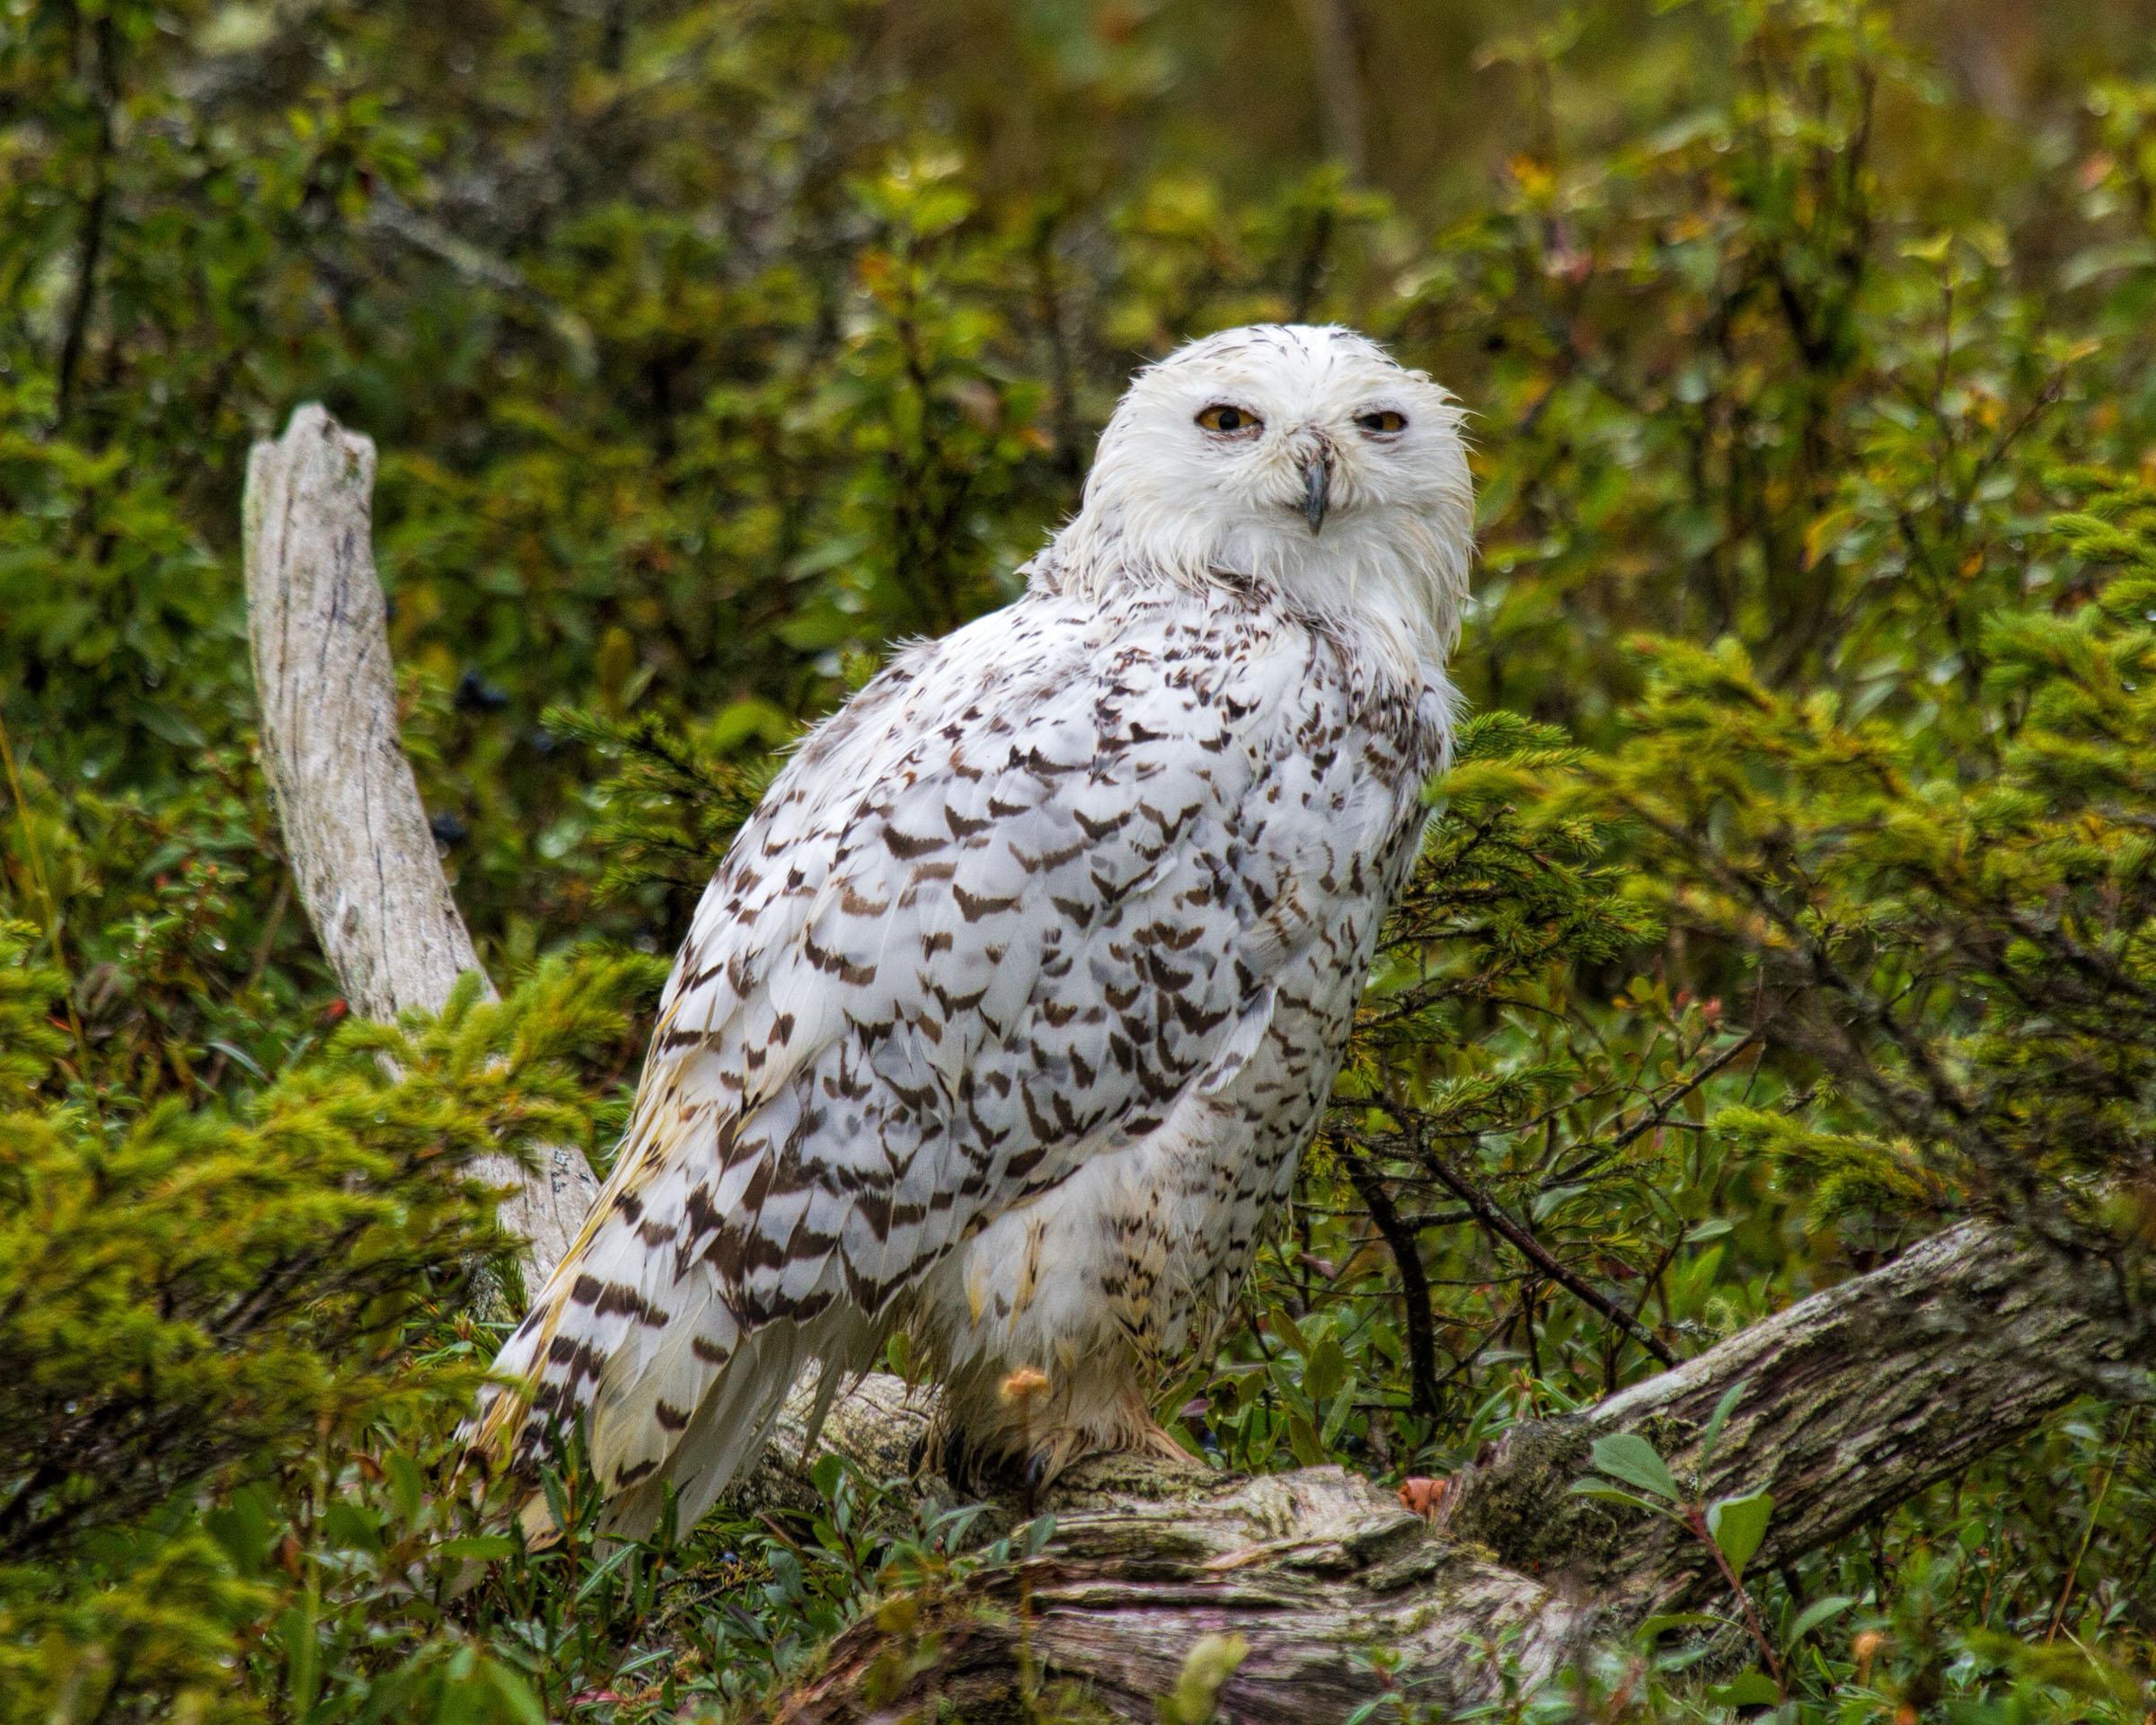 Snowy owl, America, Snow, Plumage, Polar, HQ Photo